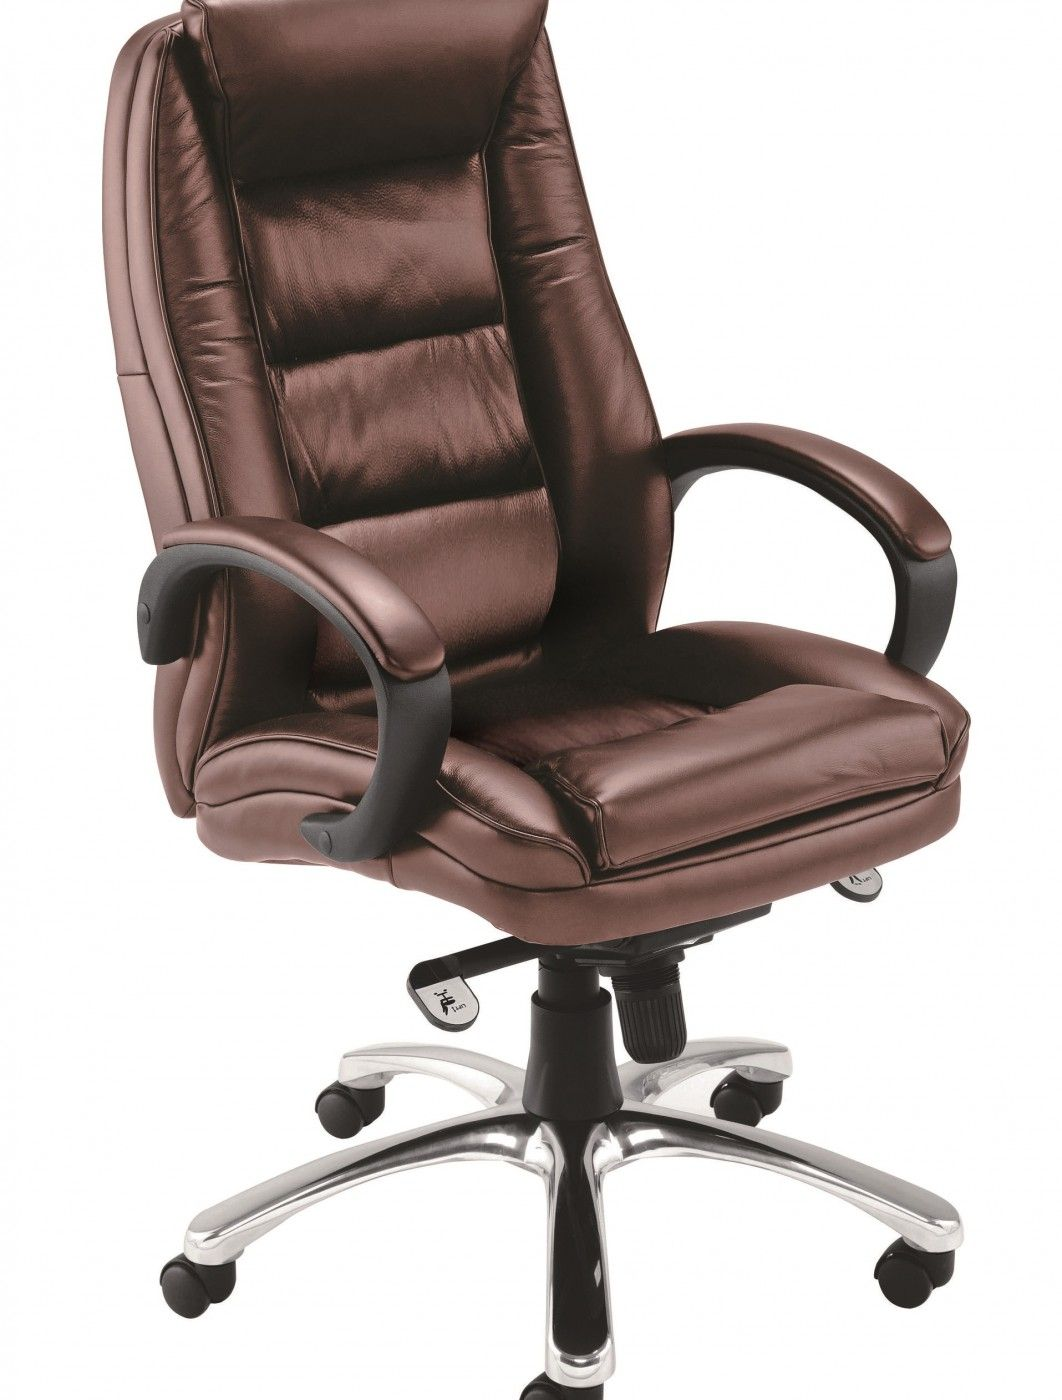 Executive Leather Office Chair Bürostuhl, Stühle, Leder